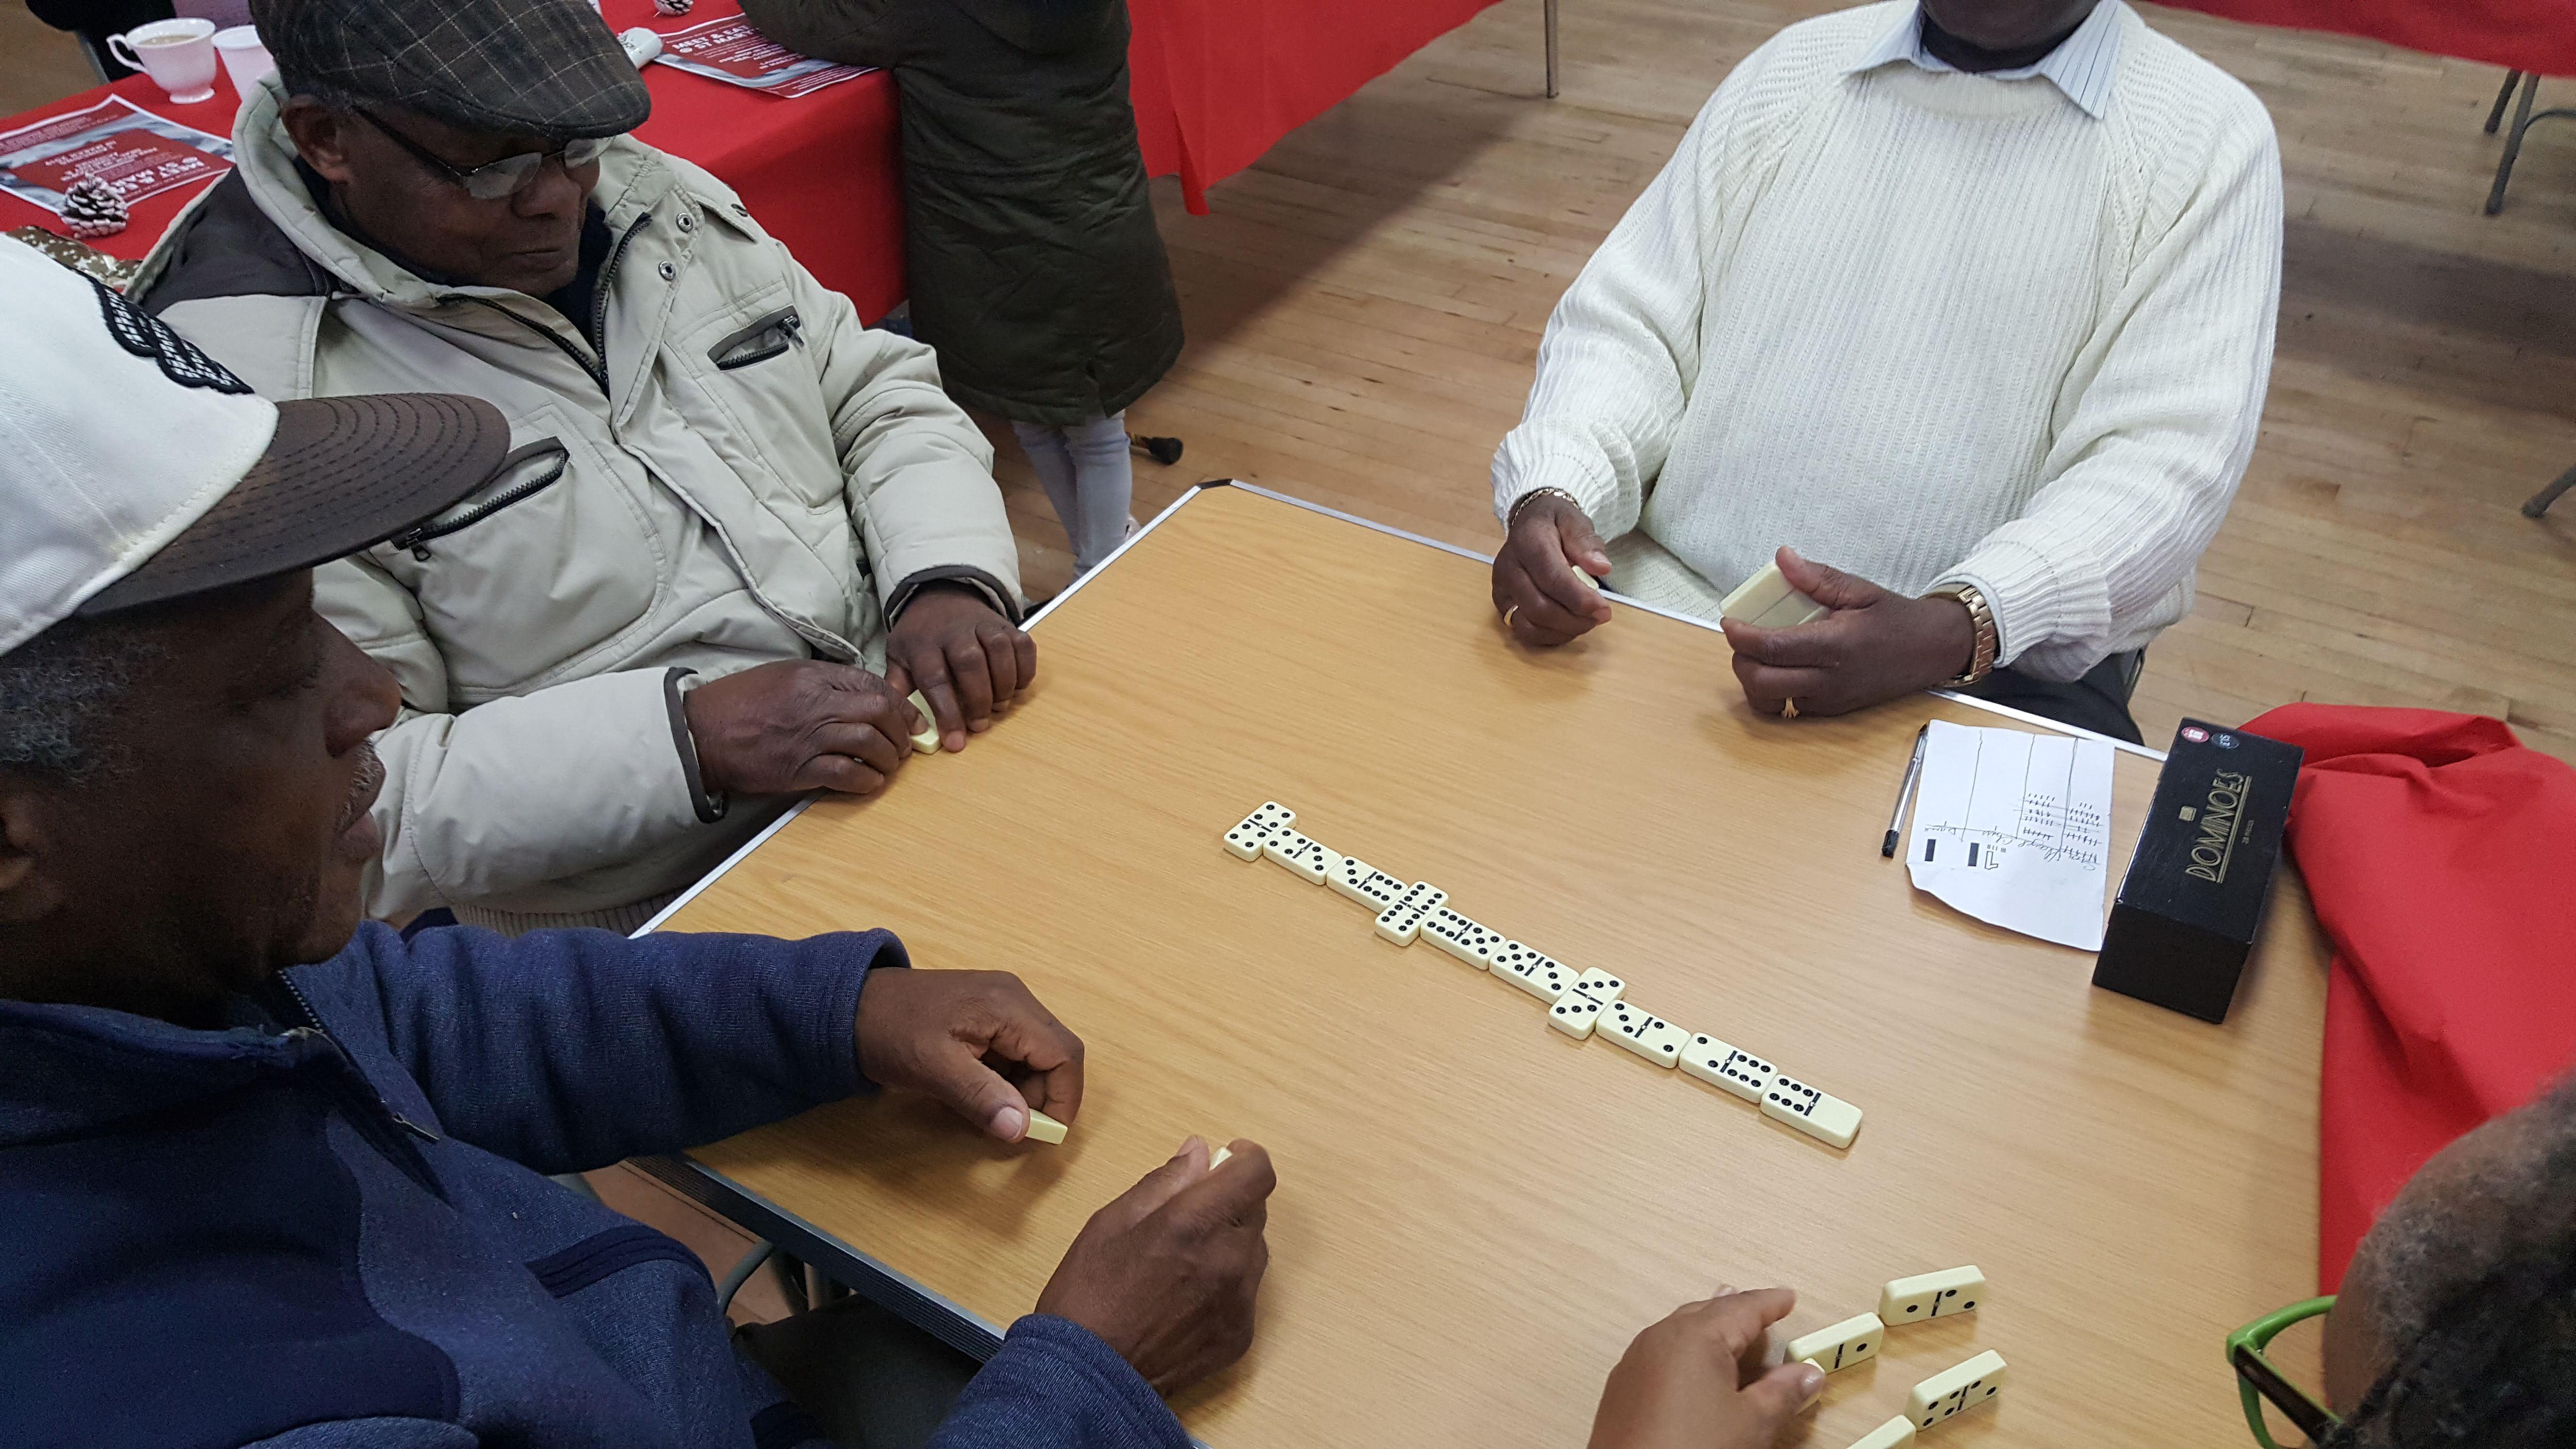 Xmas Event - 2018 - Elders enjoy a game of dominos